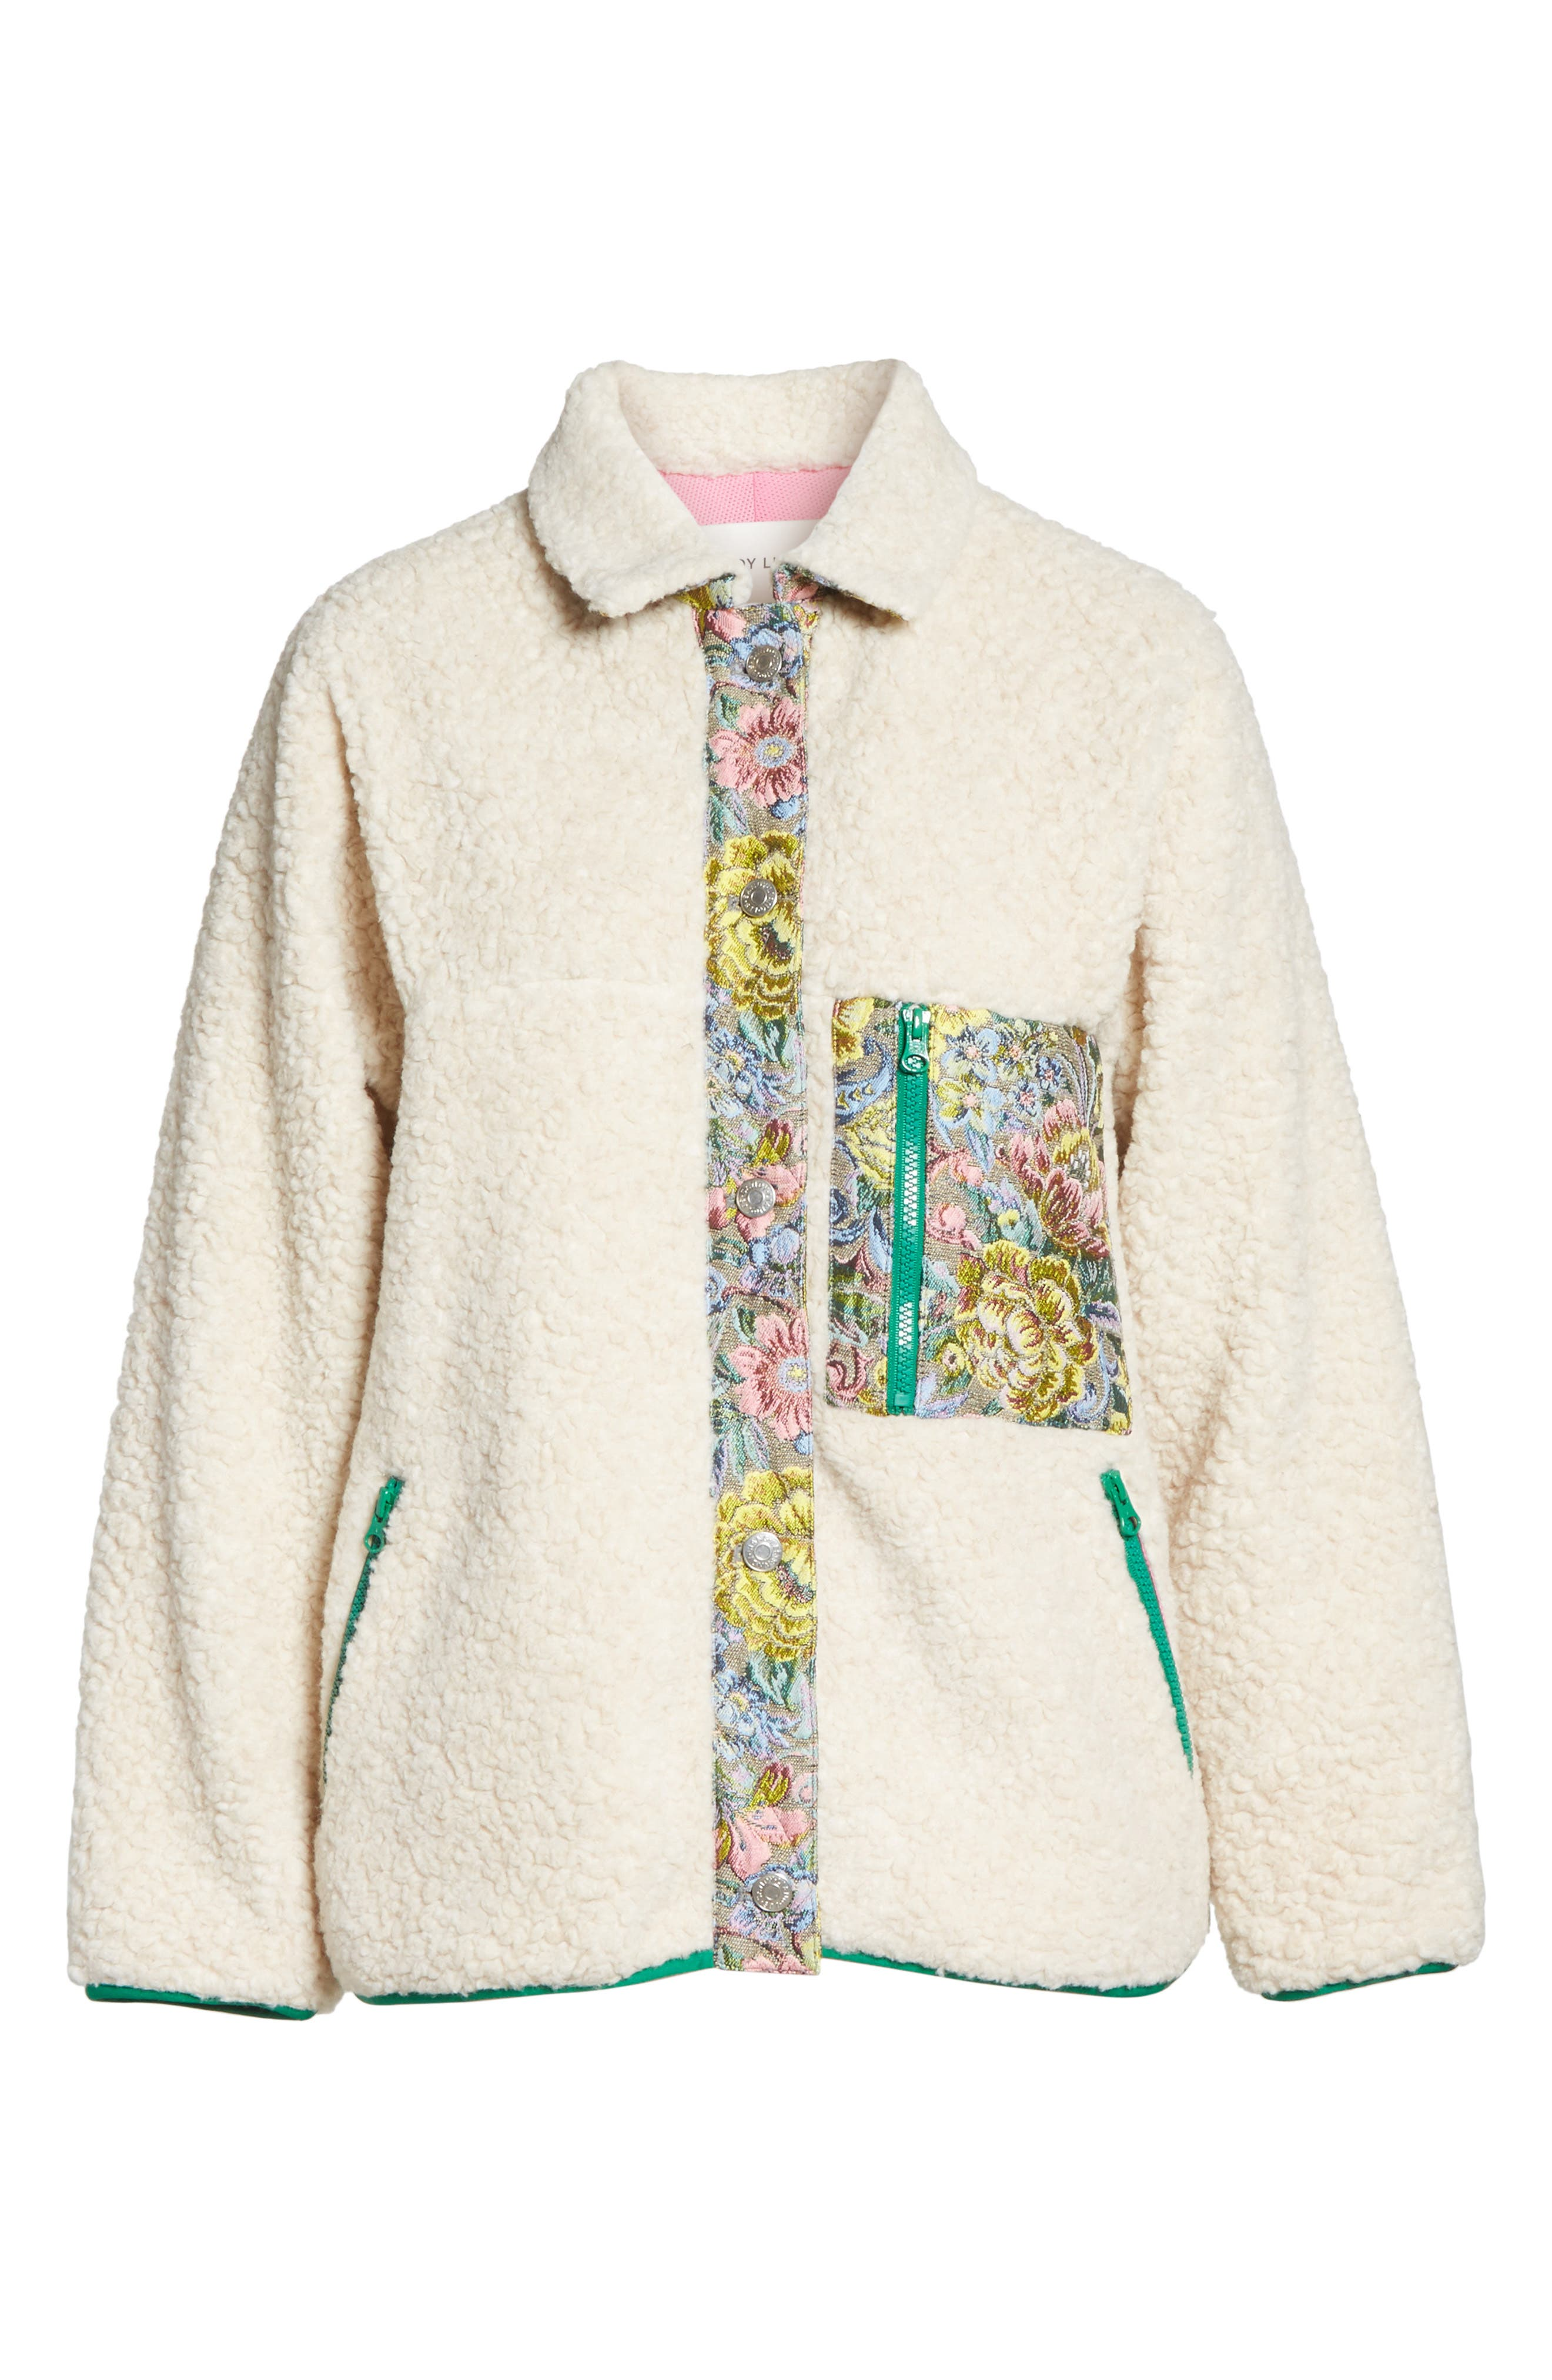 Bayside Floral Trim Fleece Jacket,                             Alternate thumbnail 7, color,                             Creamy